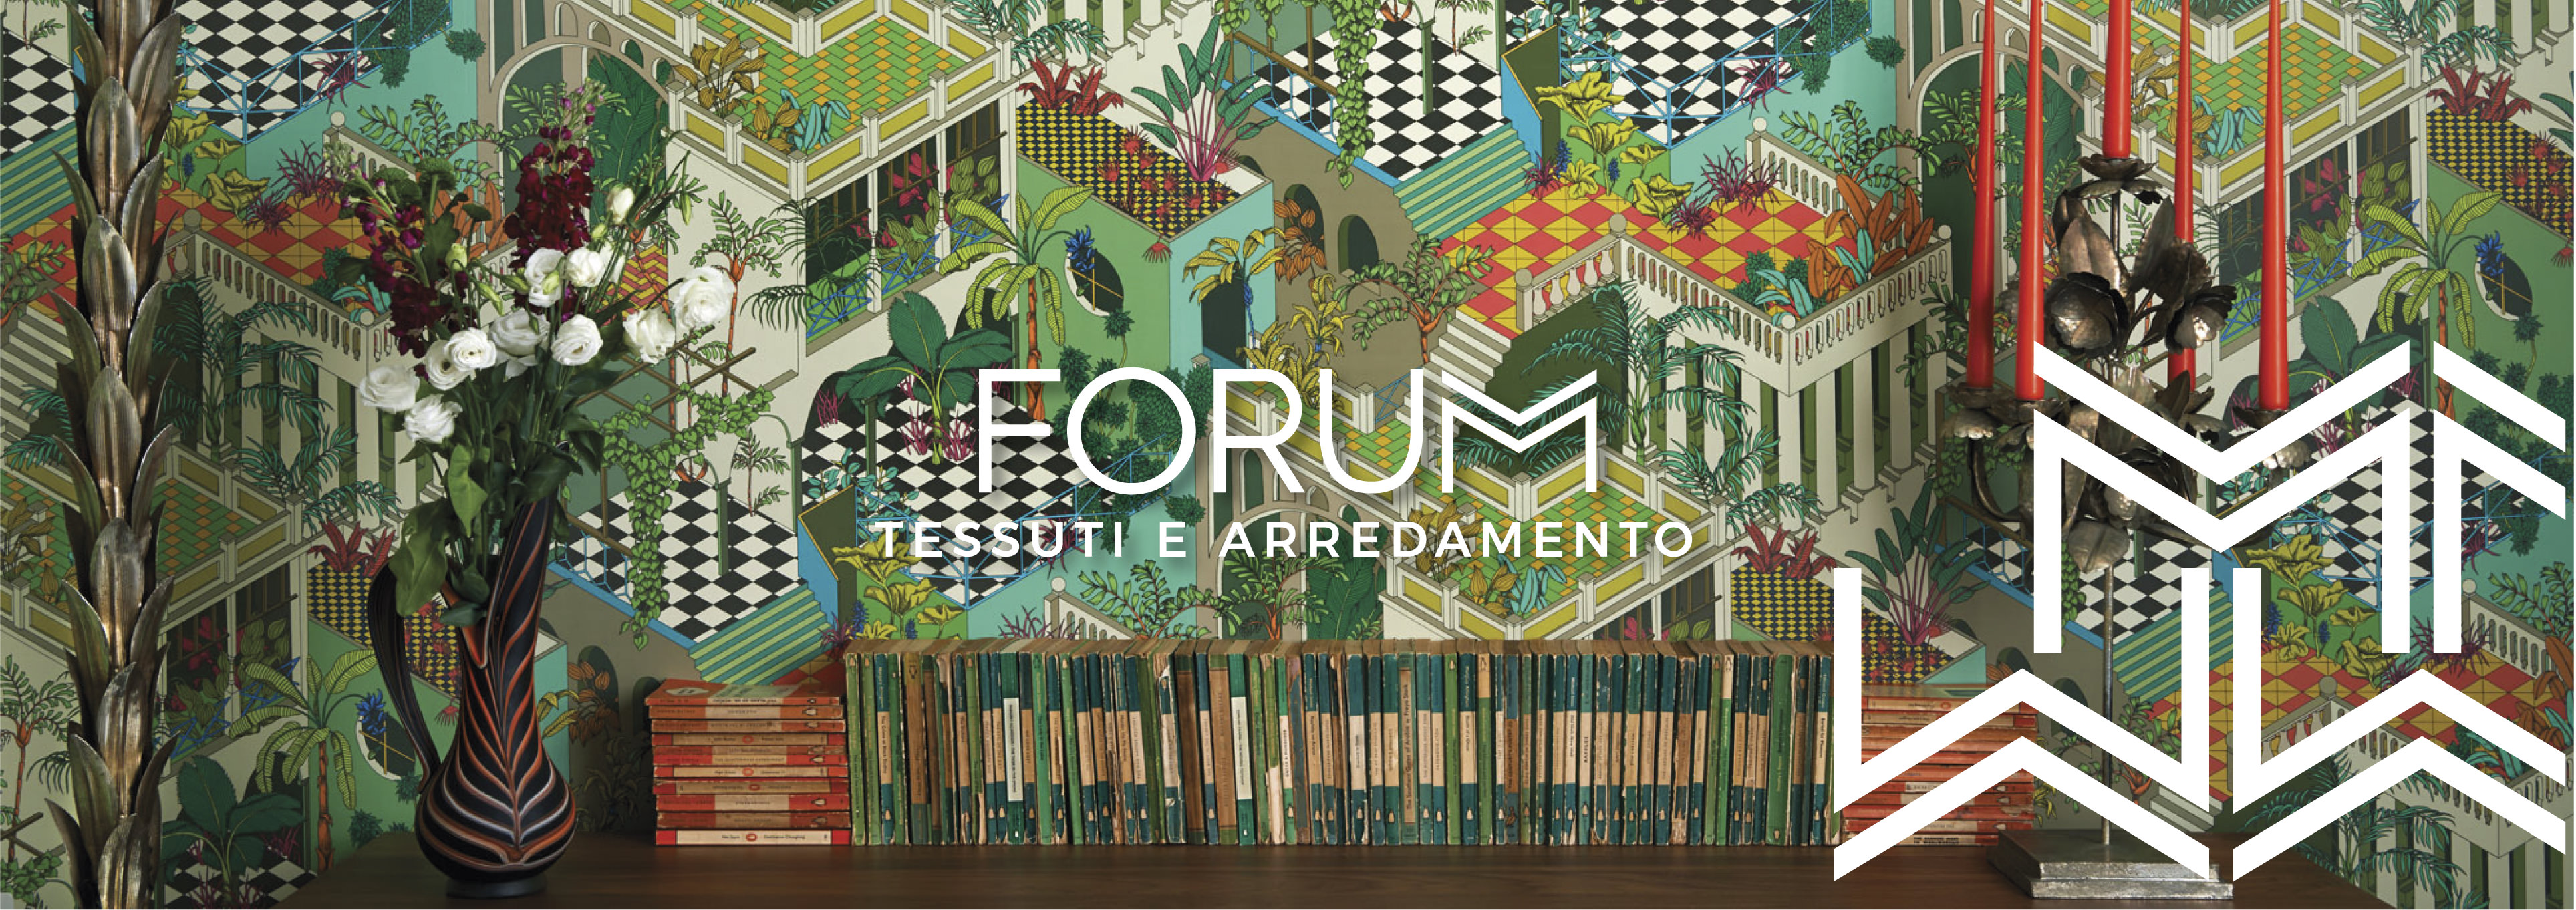 forum tessuti arredi